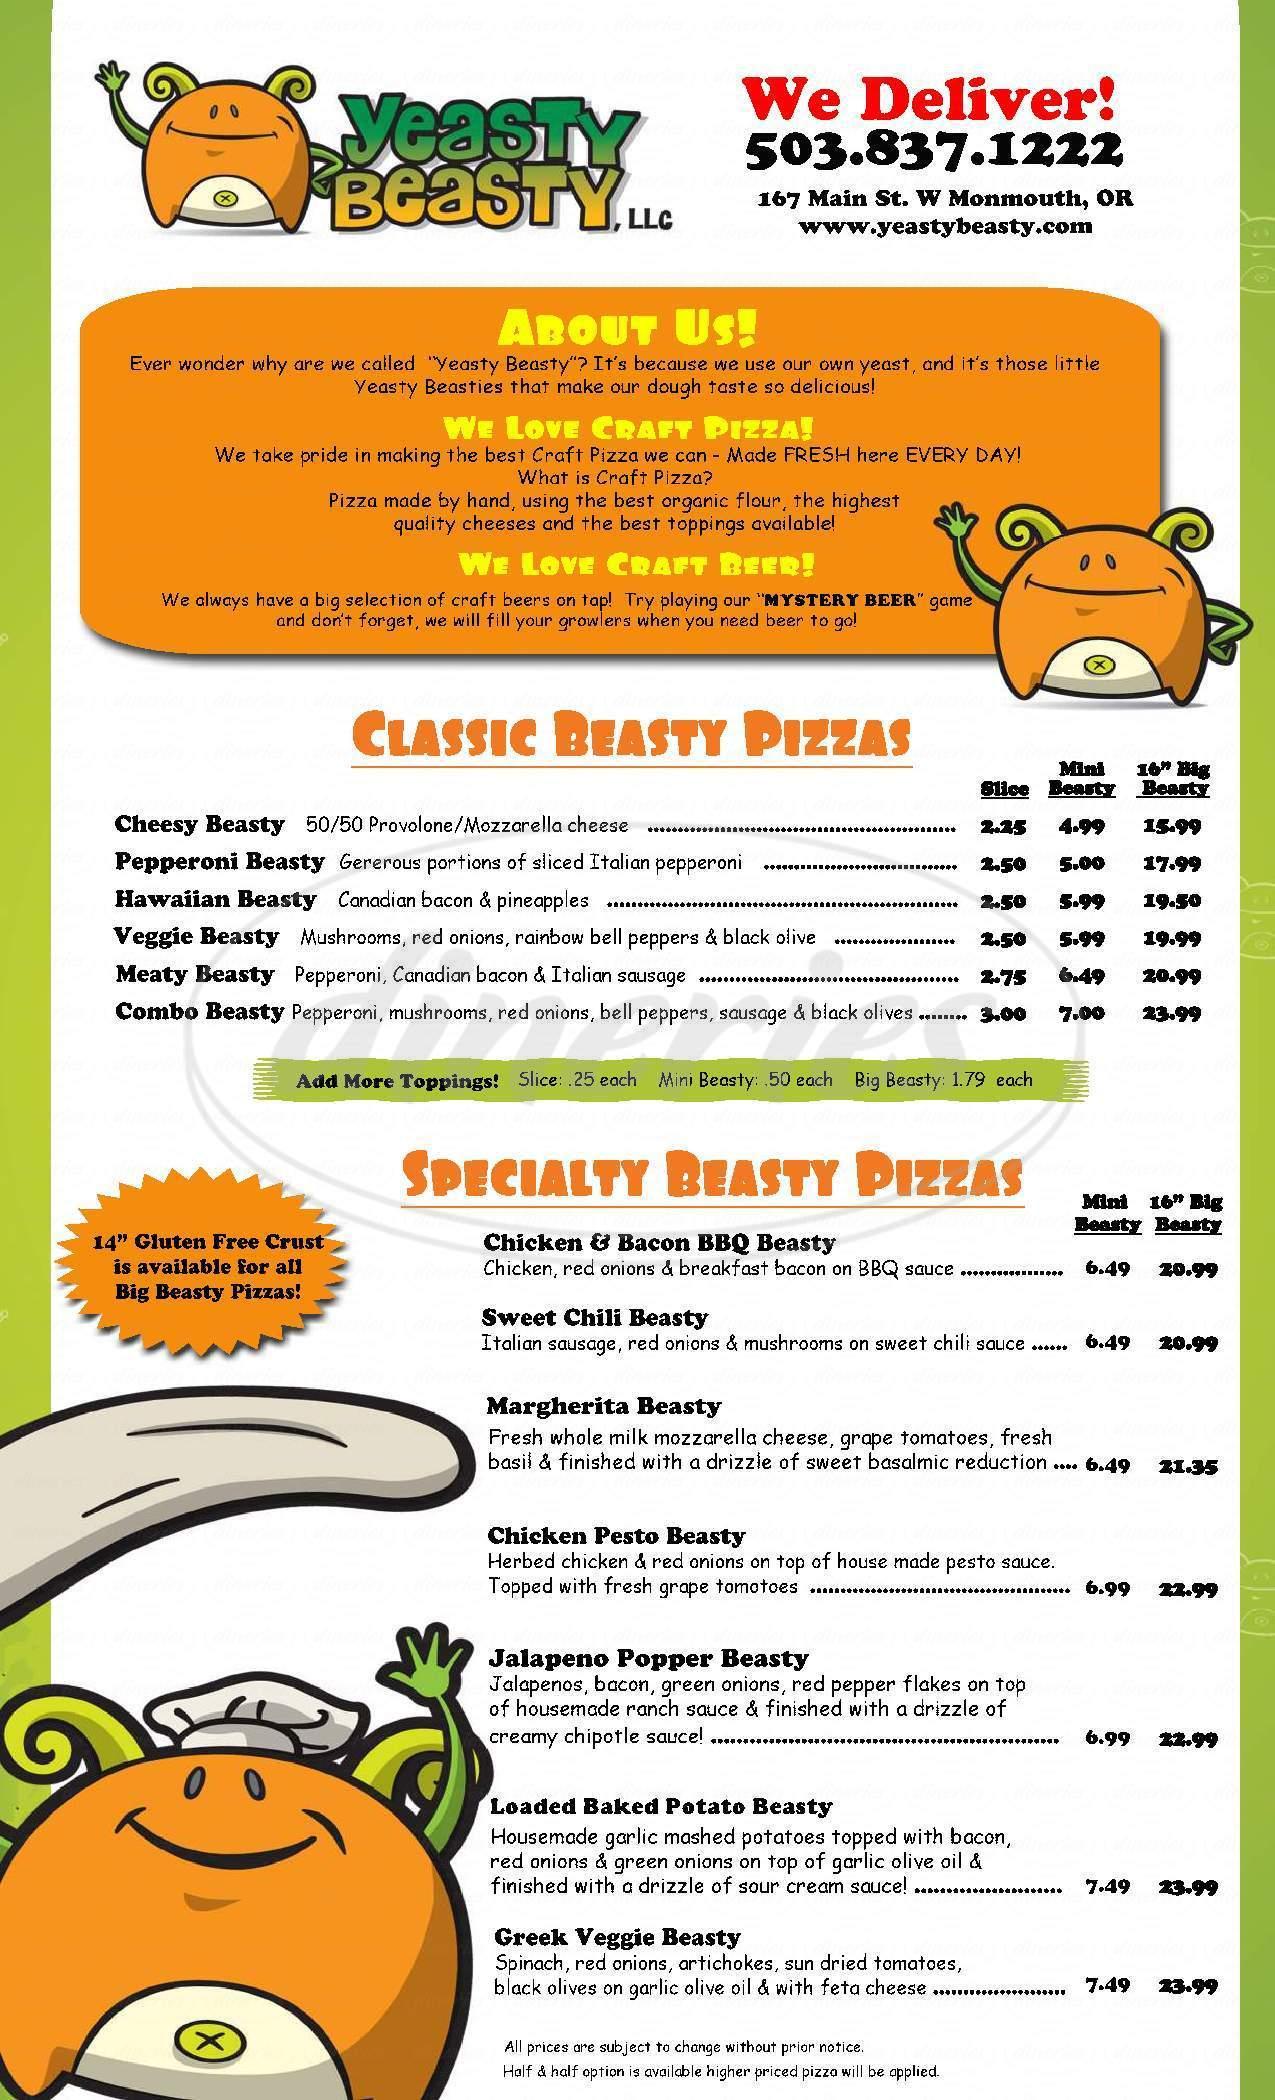 menu for Yeasty Beasty, LLC